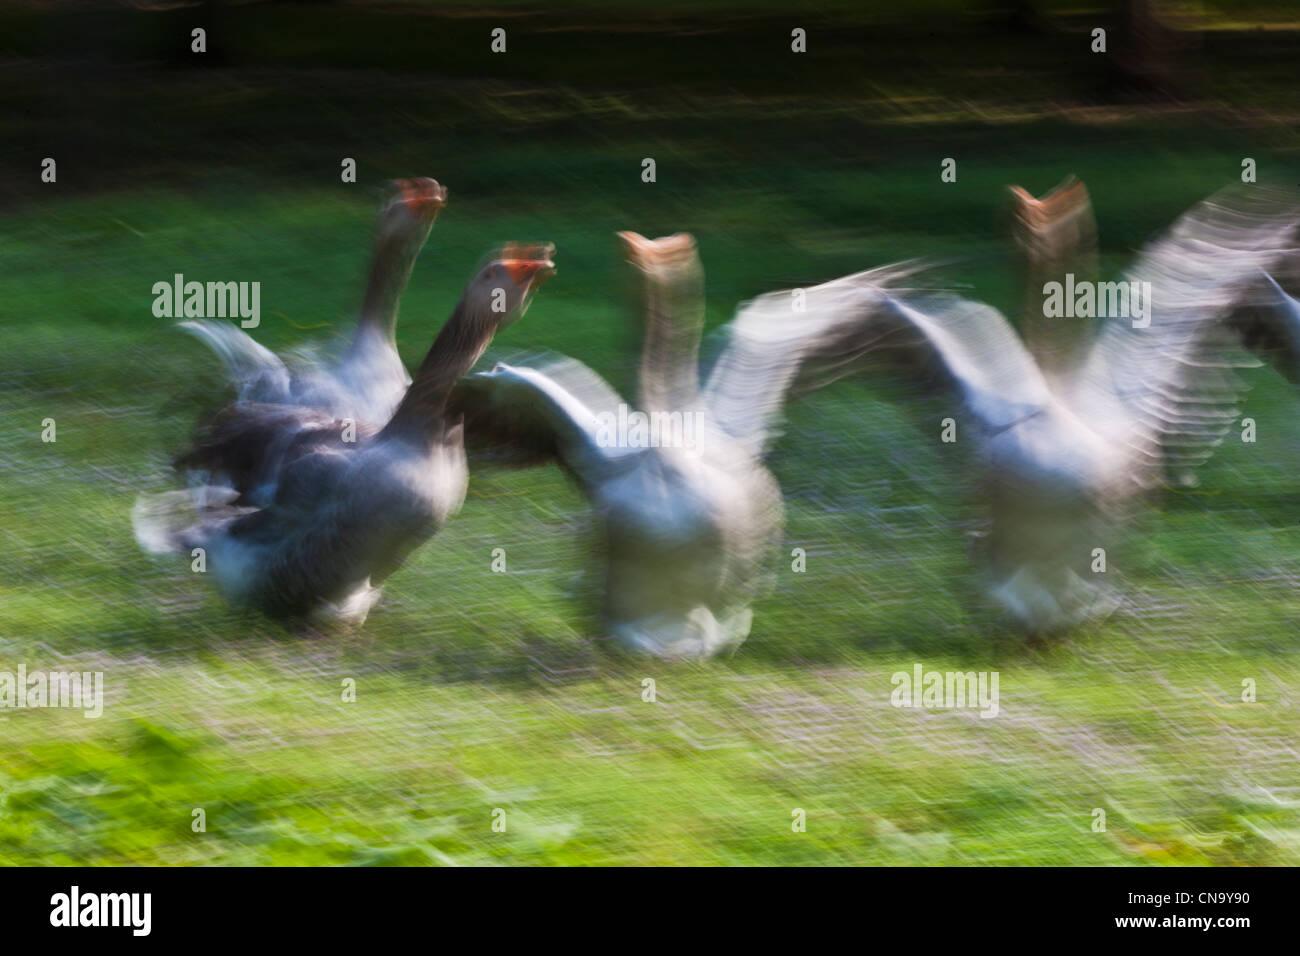 France, Dordogne, Domme, breeding geese at La Ferme de Turnac - Stock Image